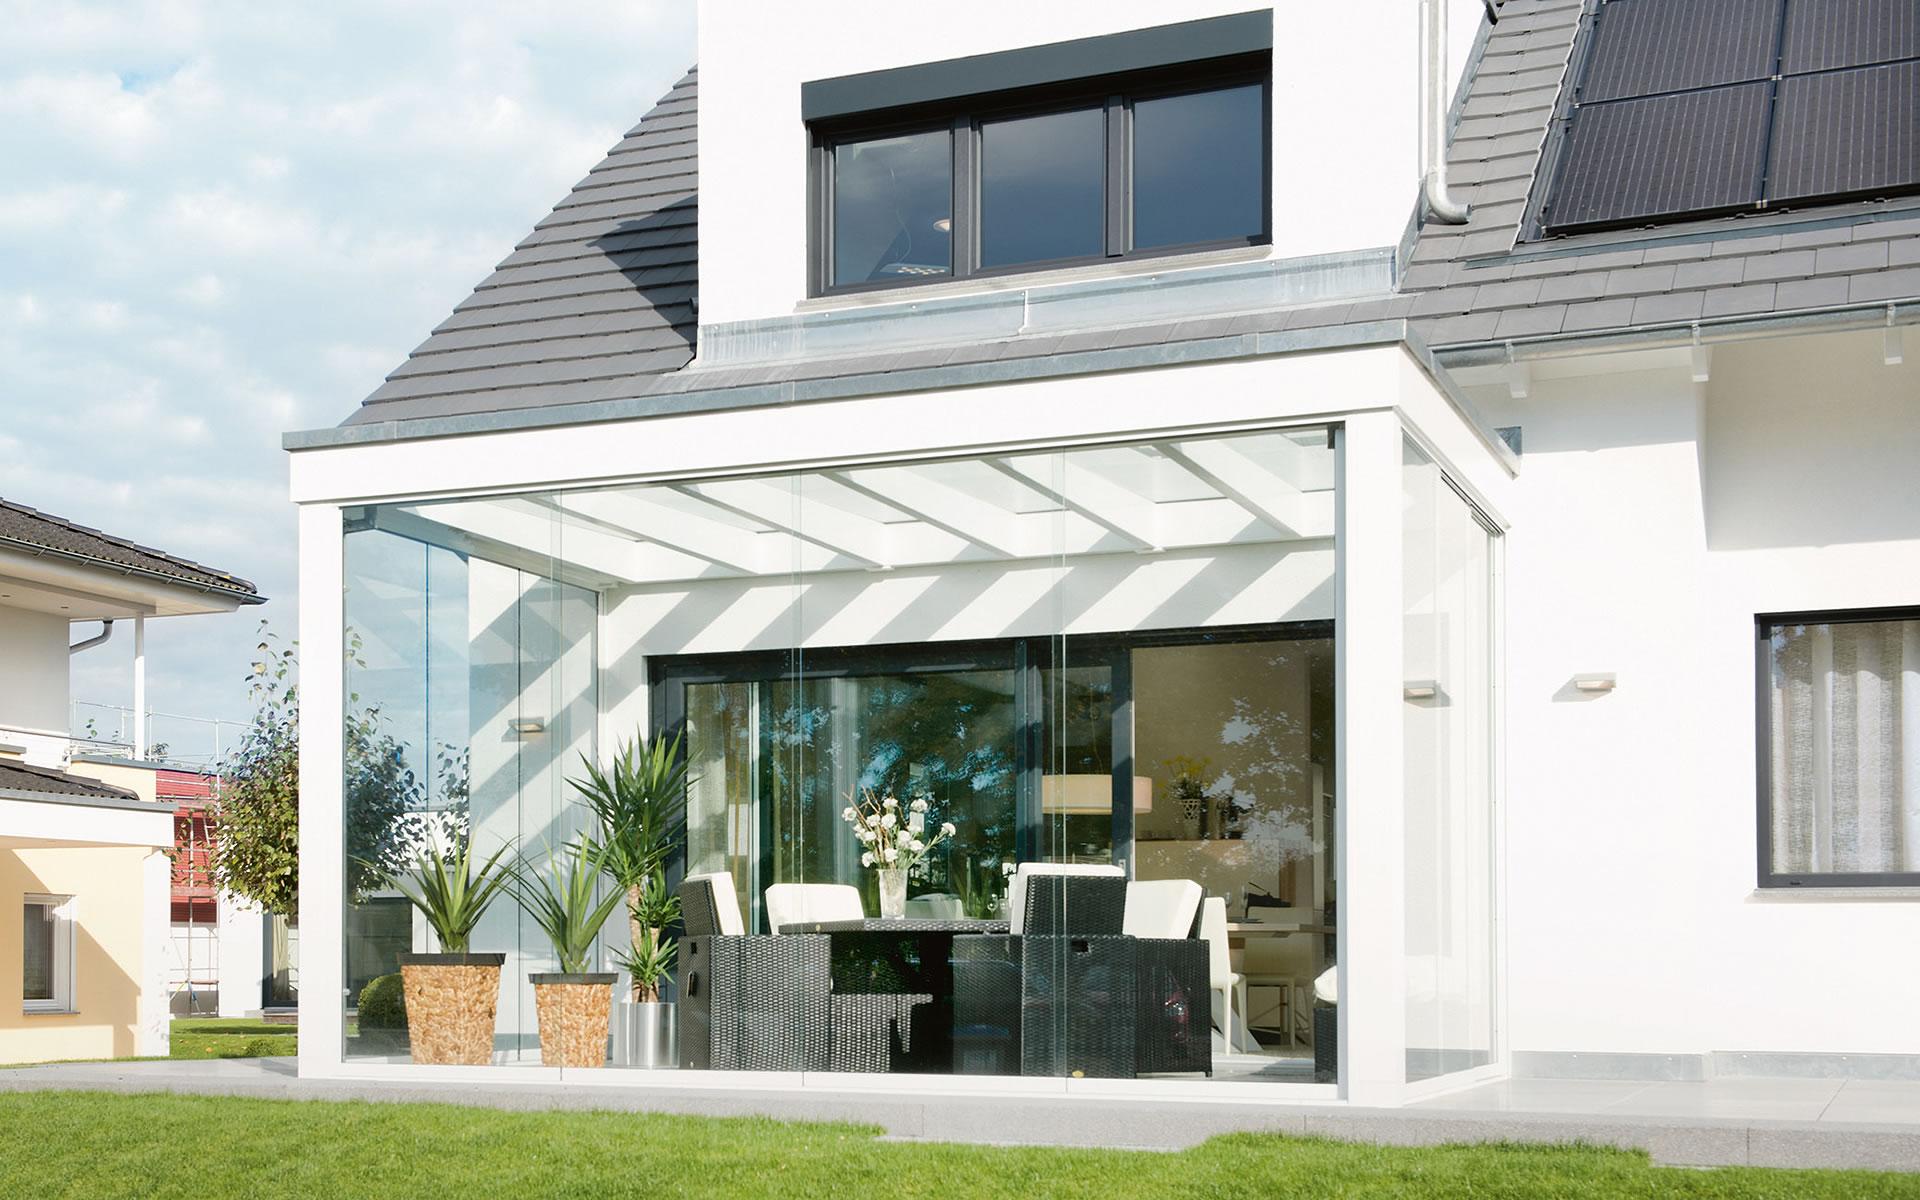 Musterhaus Mannheim (Balance 250) von WeberHaus GmbH & Co. KG